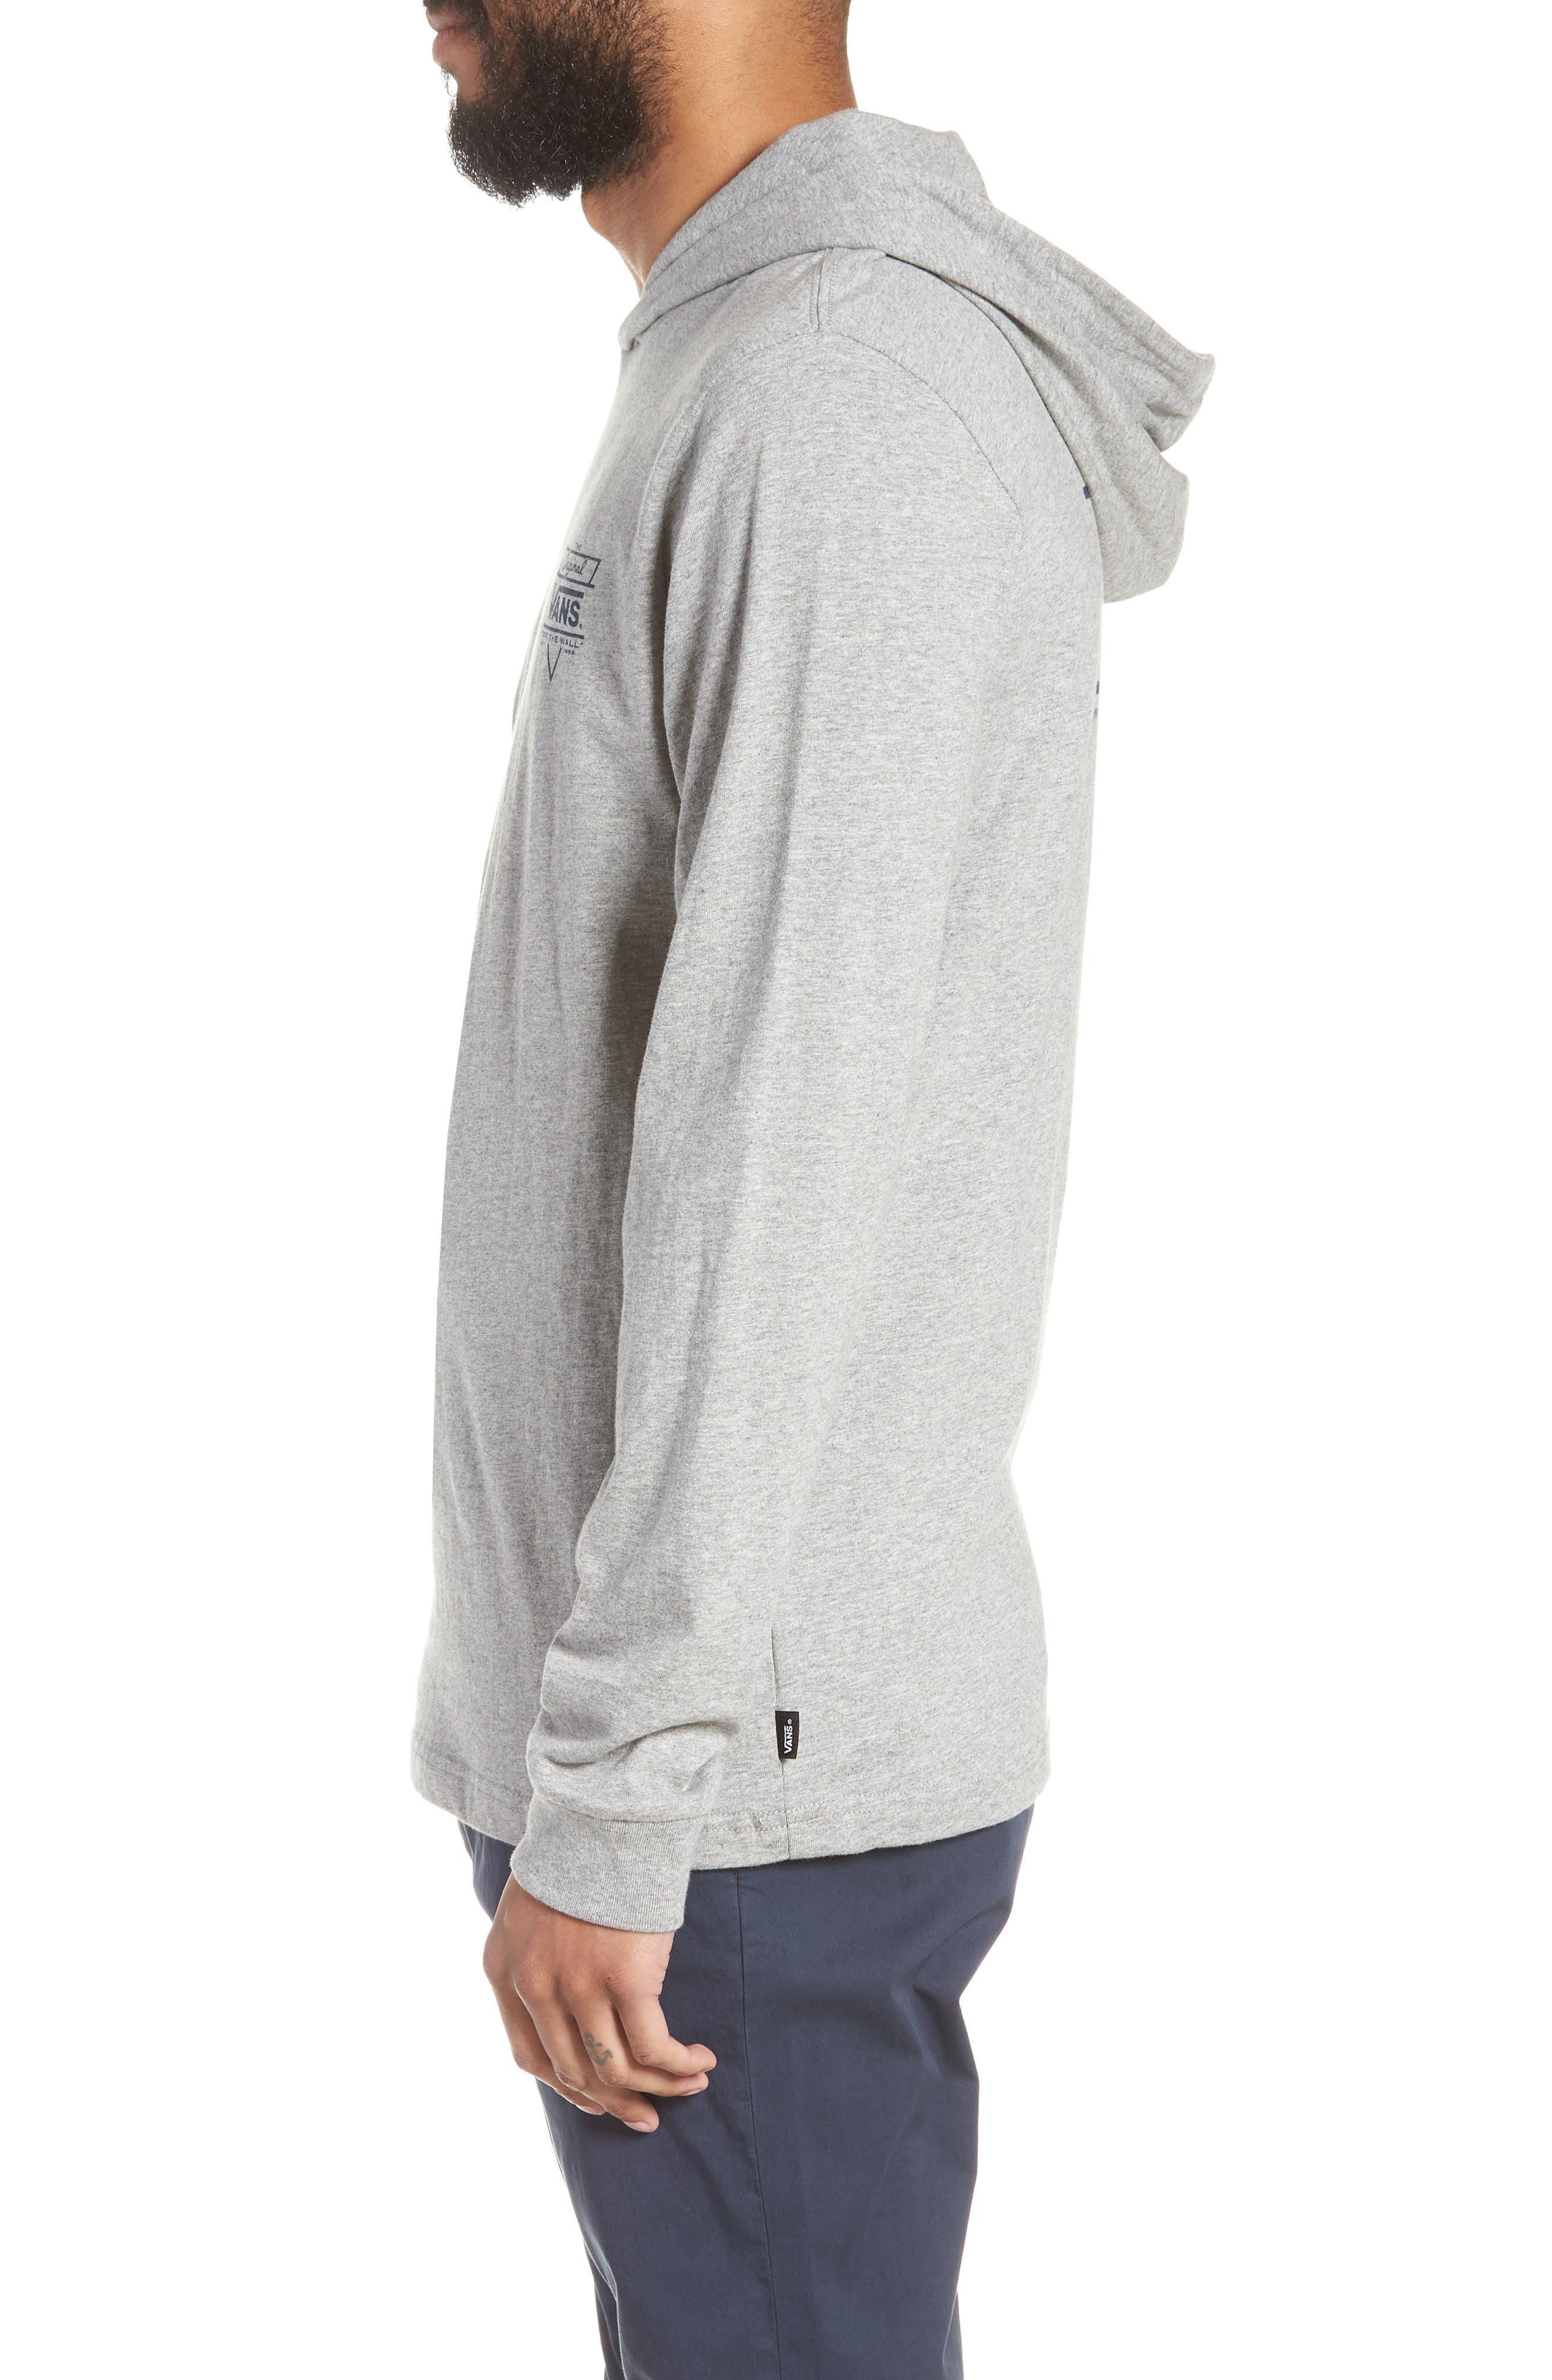 Van Doren Hooded T-Shirt,                             Alternate thumbnail 3, color,                             Cement Heather/ Dress Blues